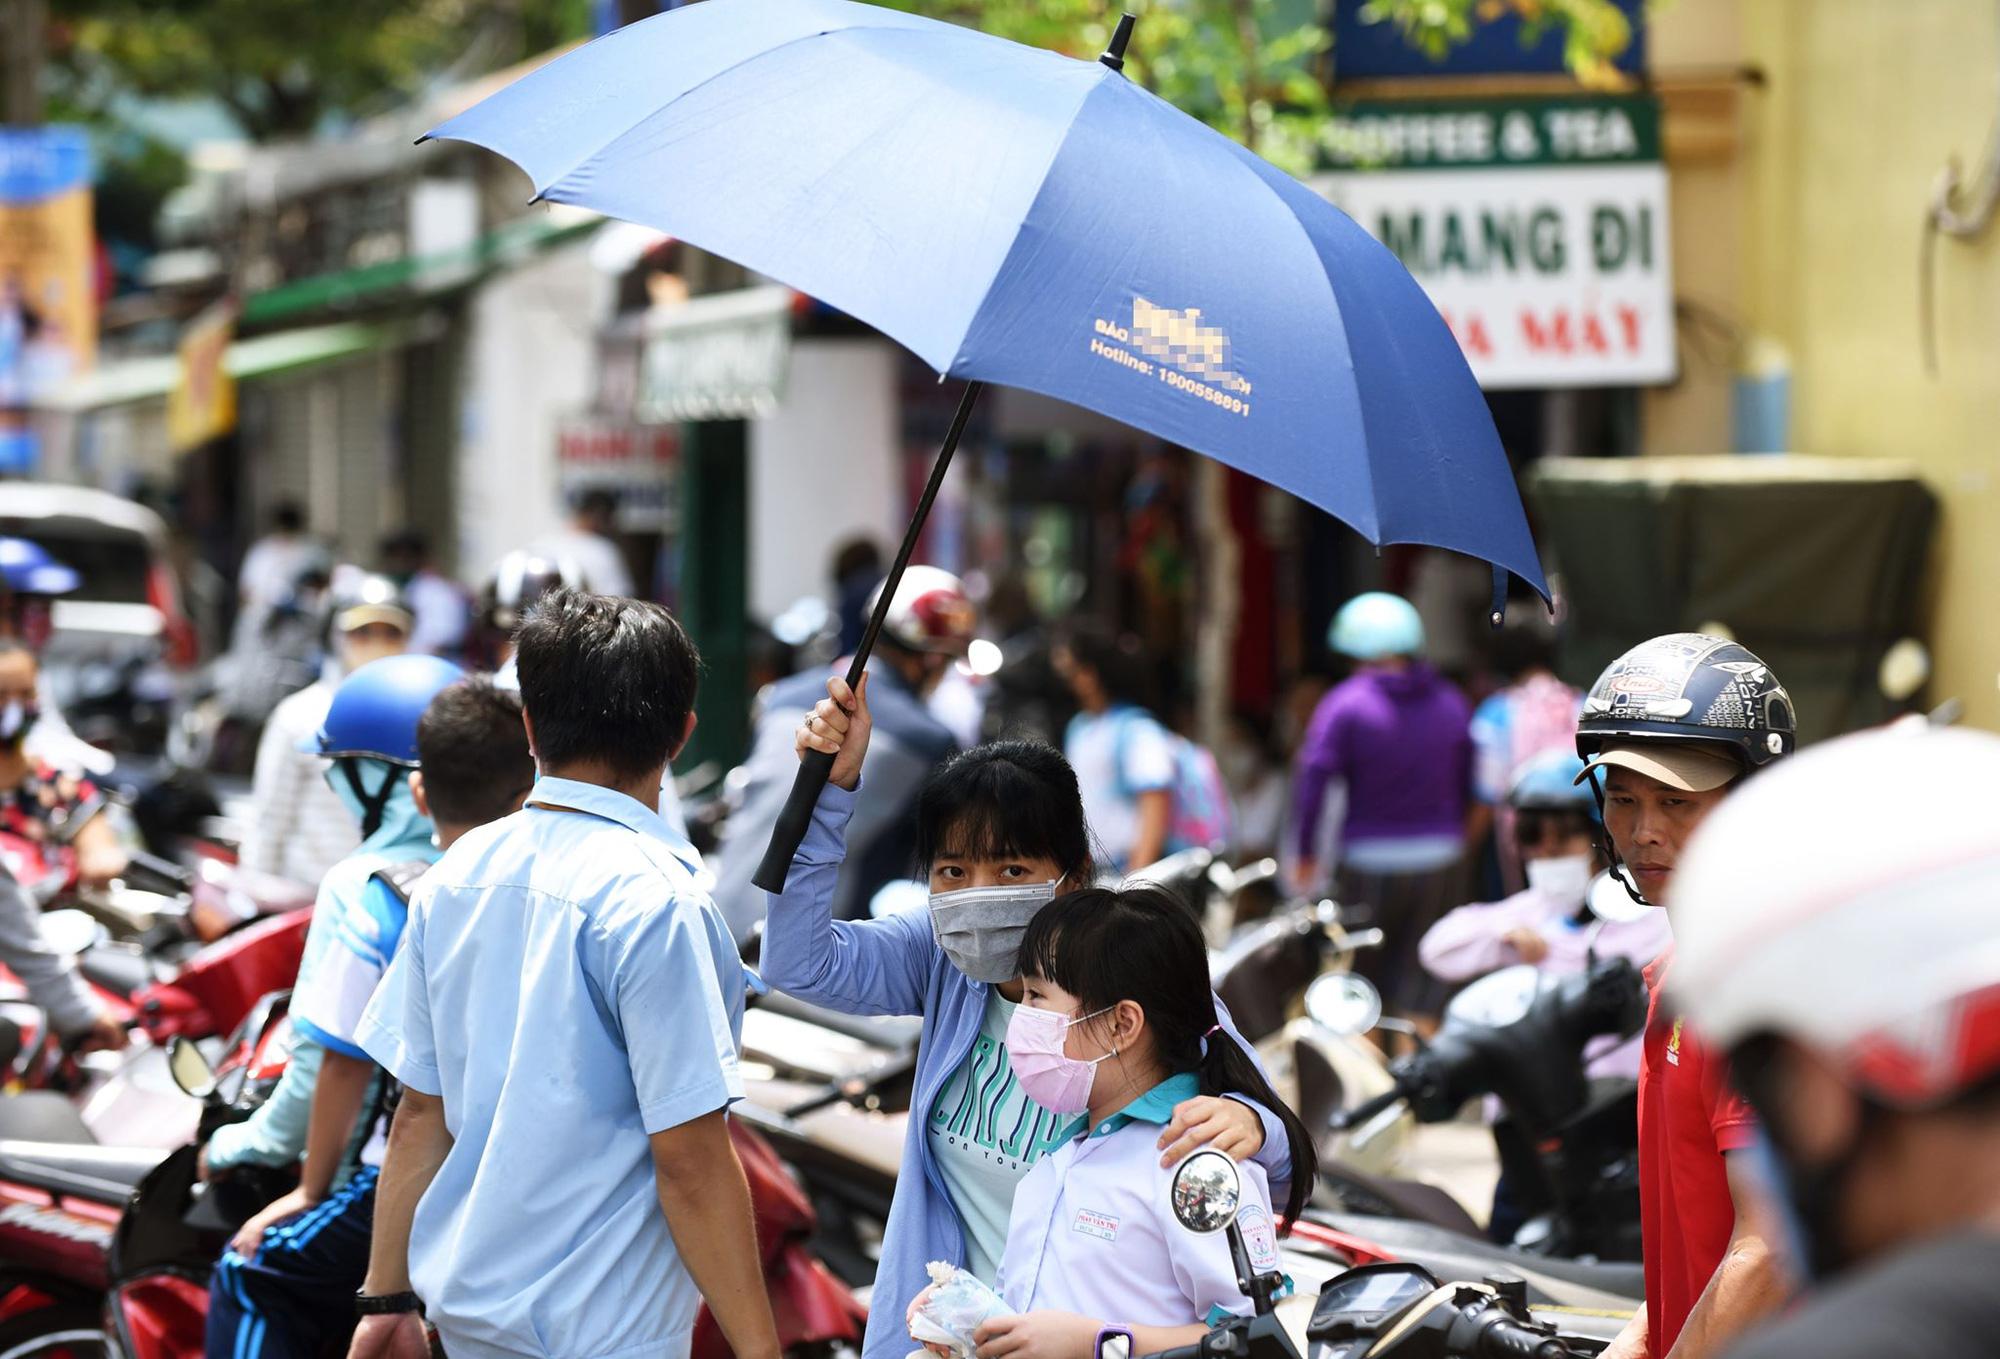 Scorching weather plagues Ho Chi Minh City as rainy season nears